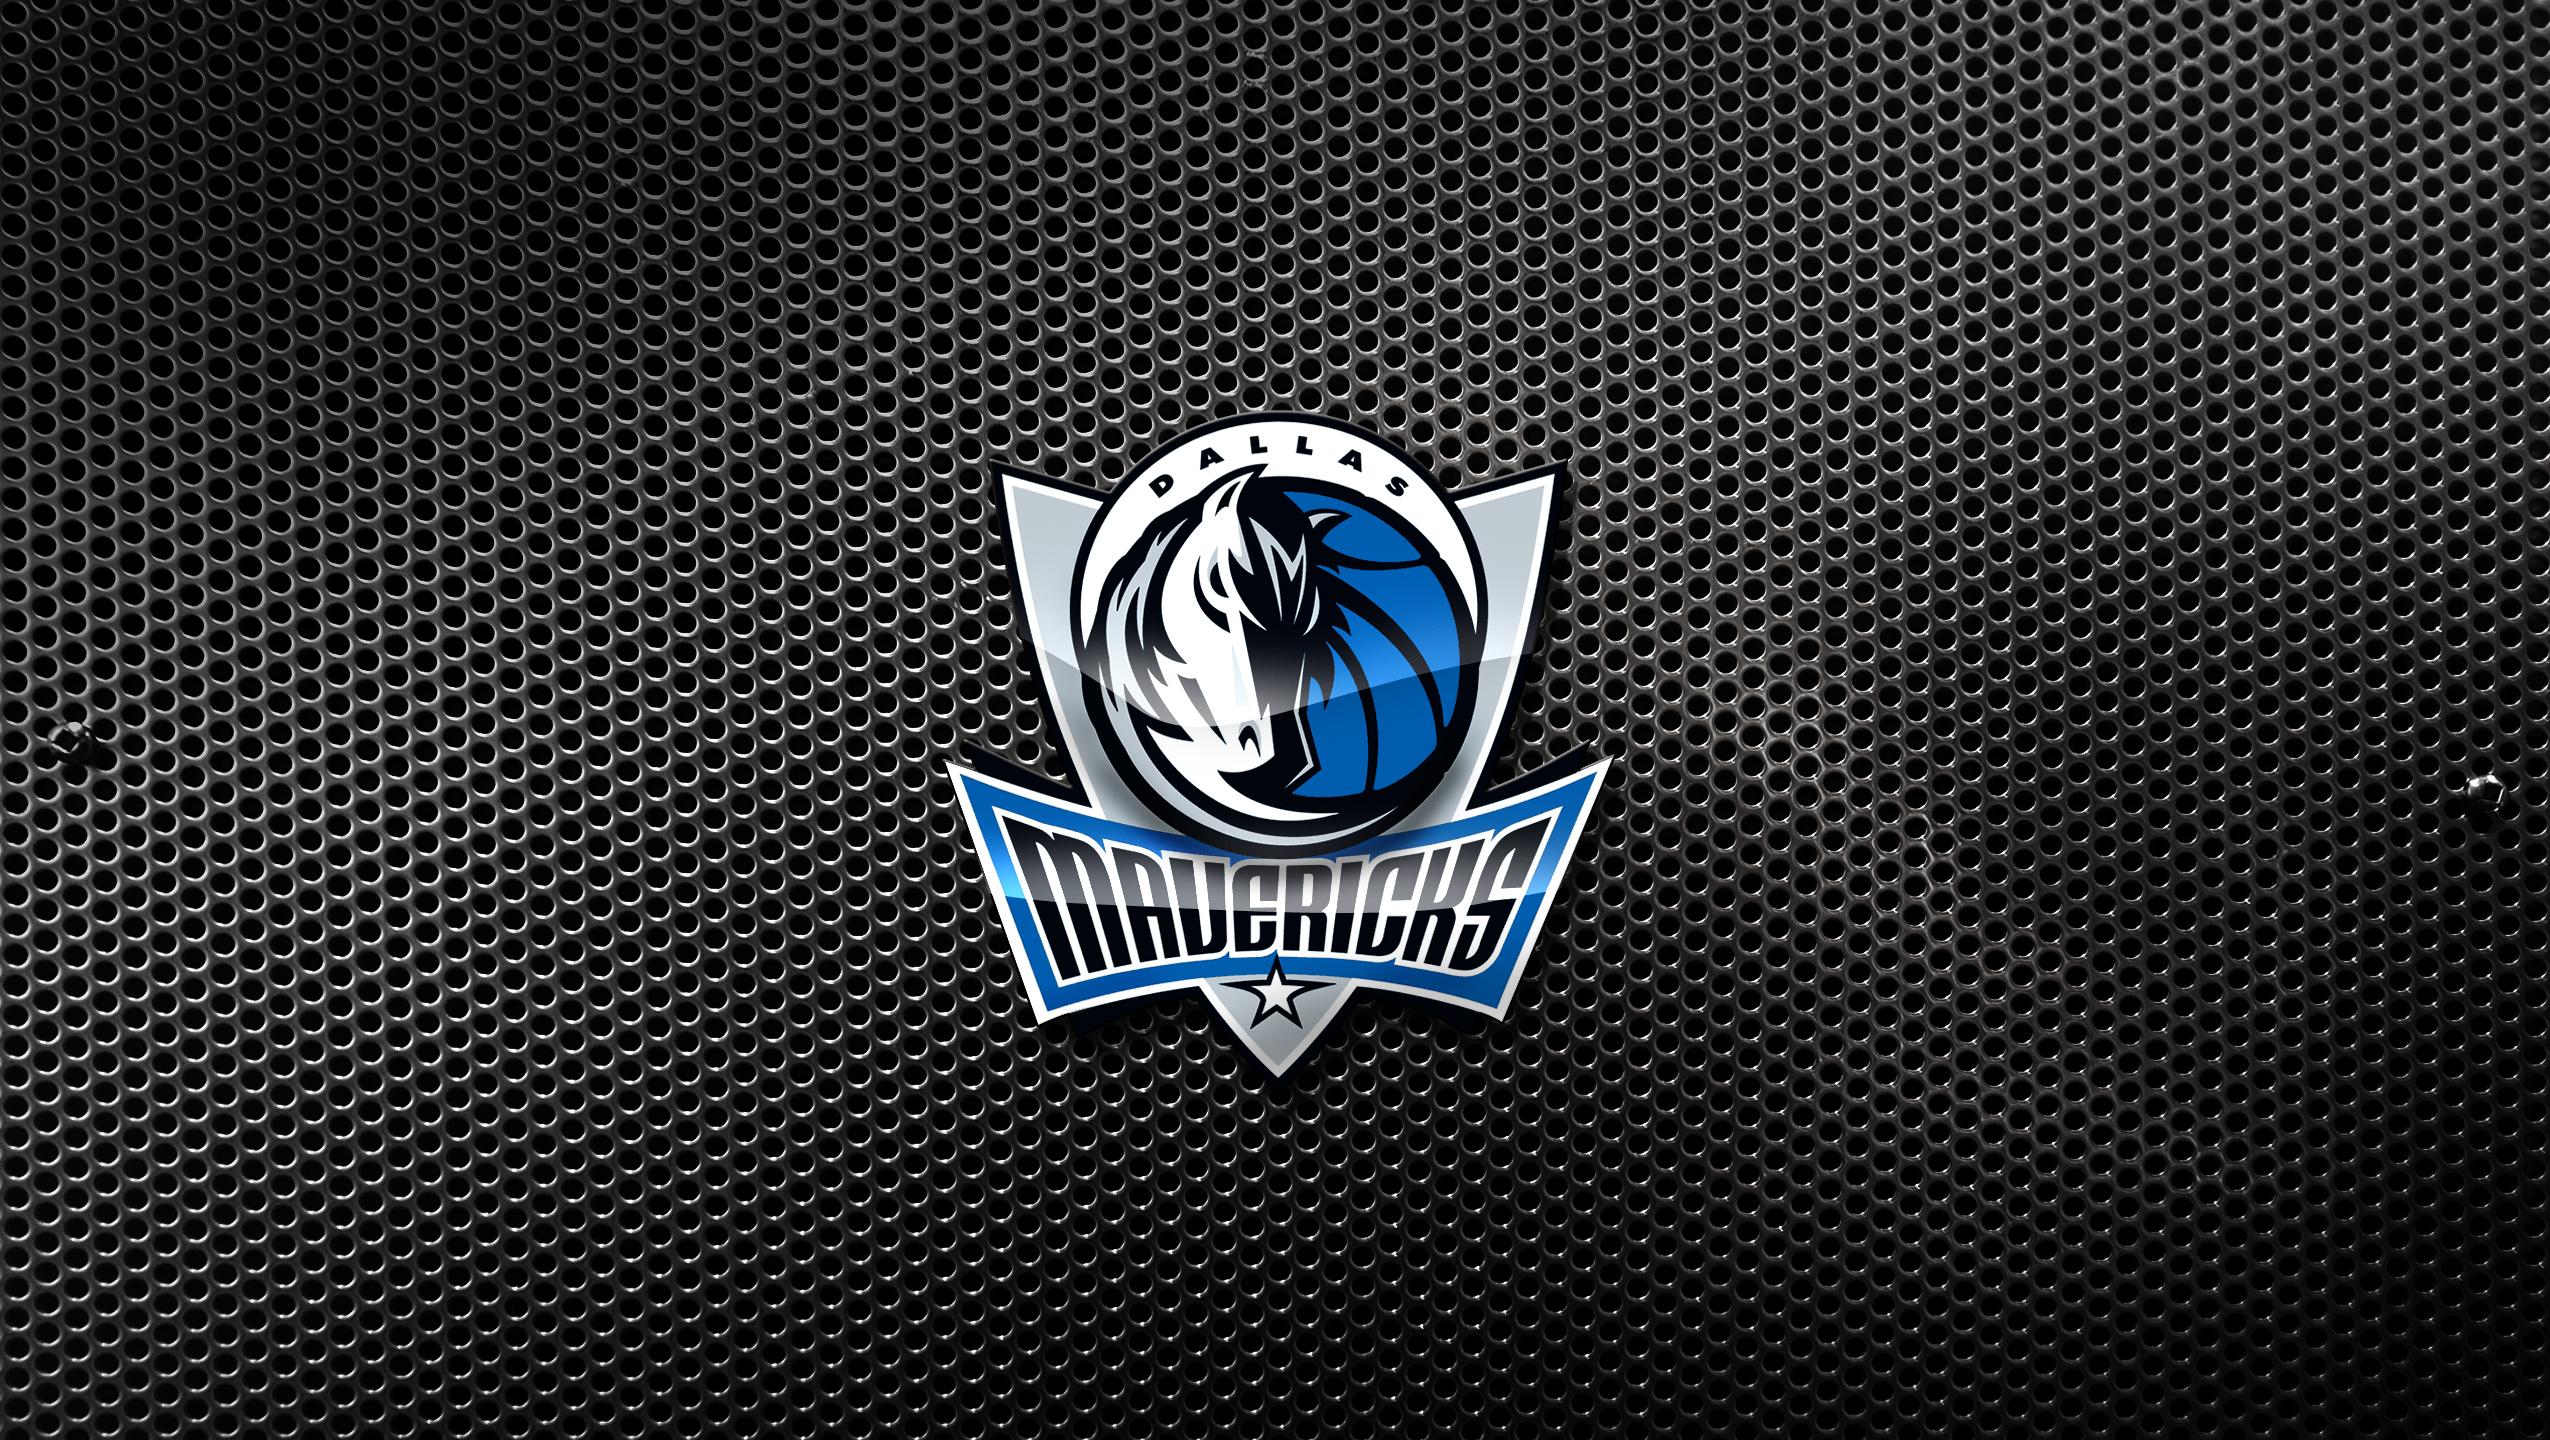 Wallpaper 2550x1440 Px 34 Basketball Dallas Mavericks